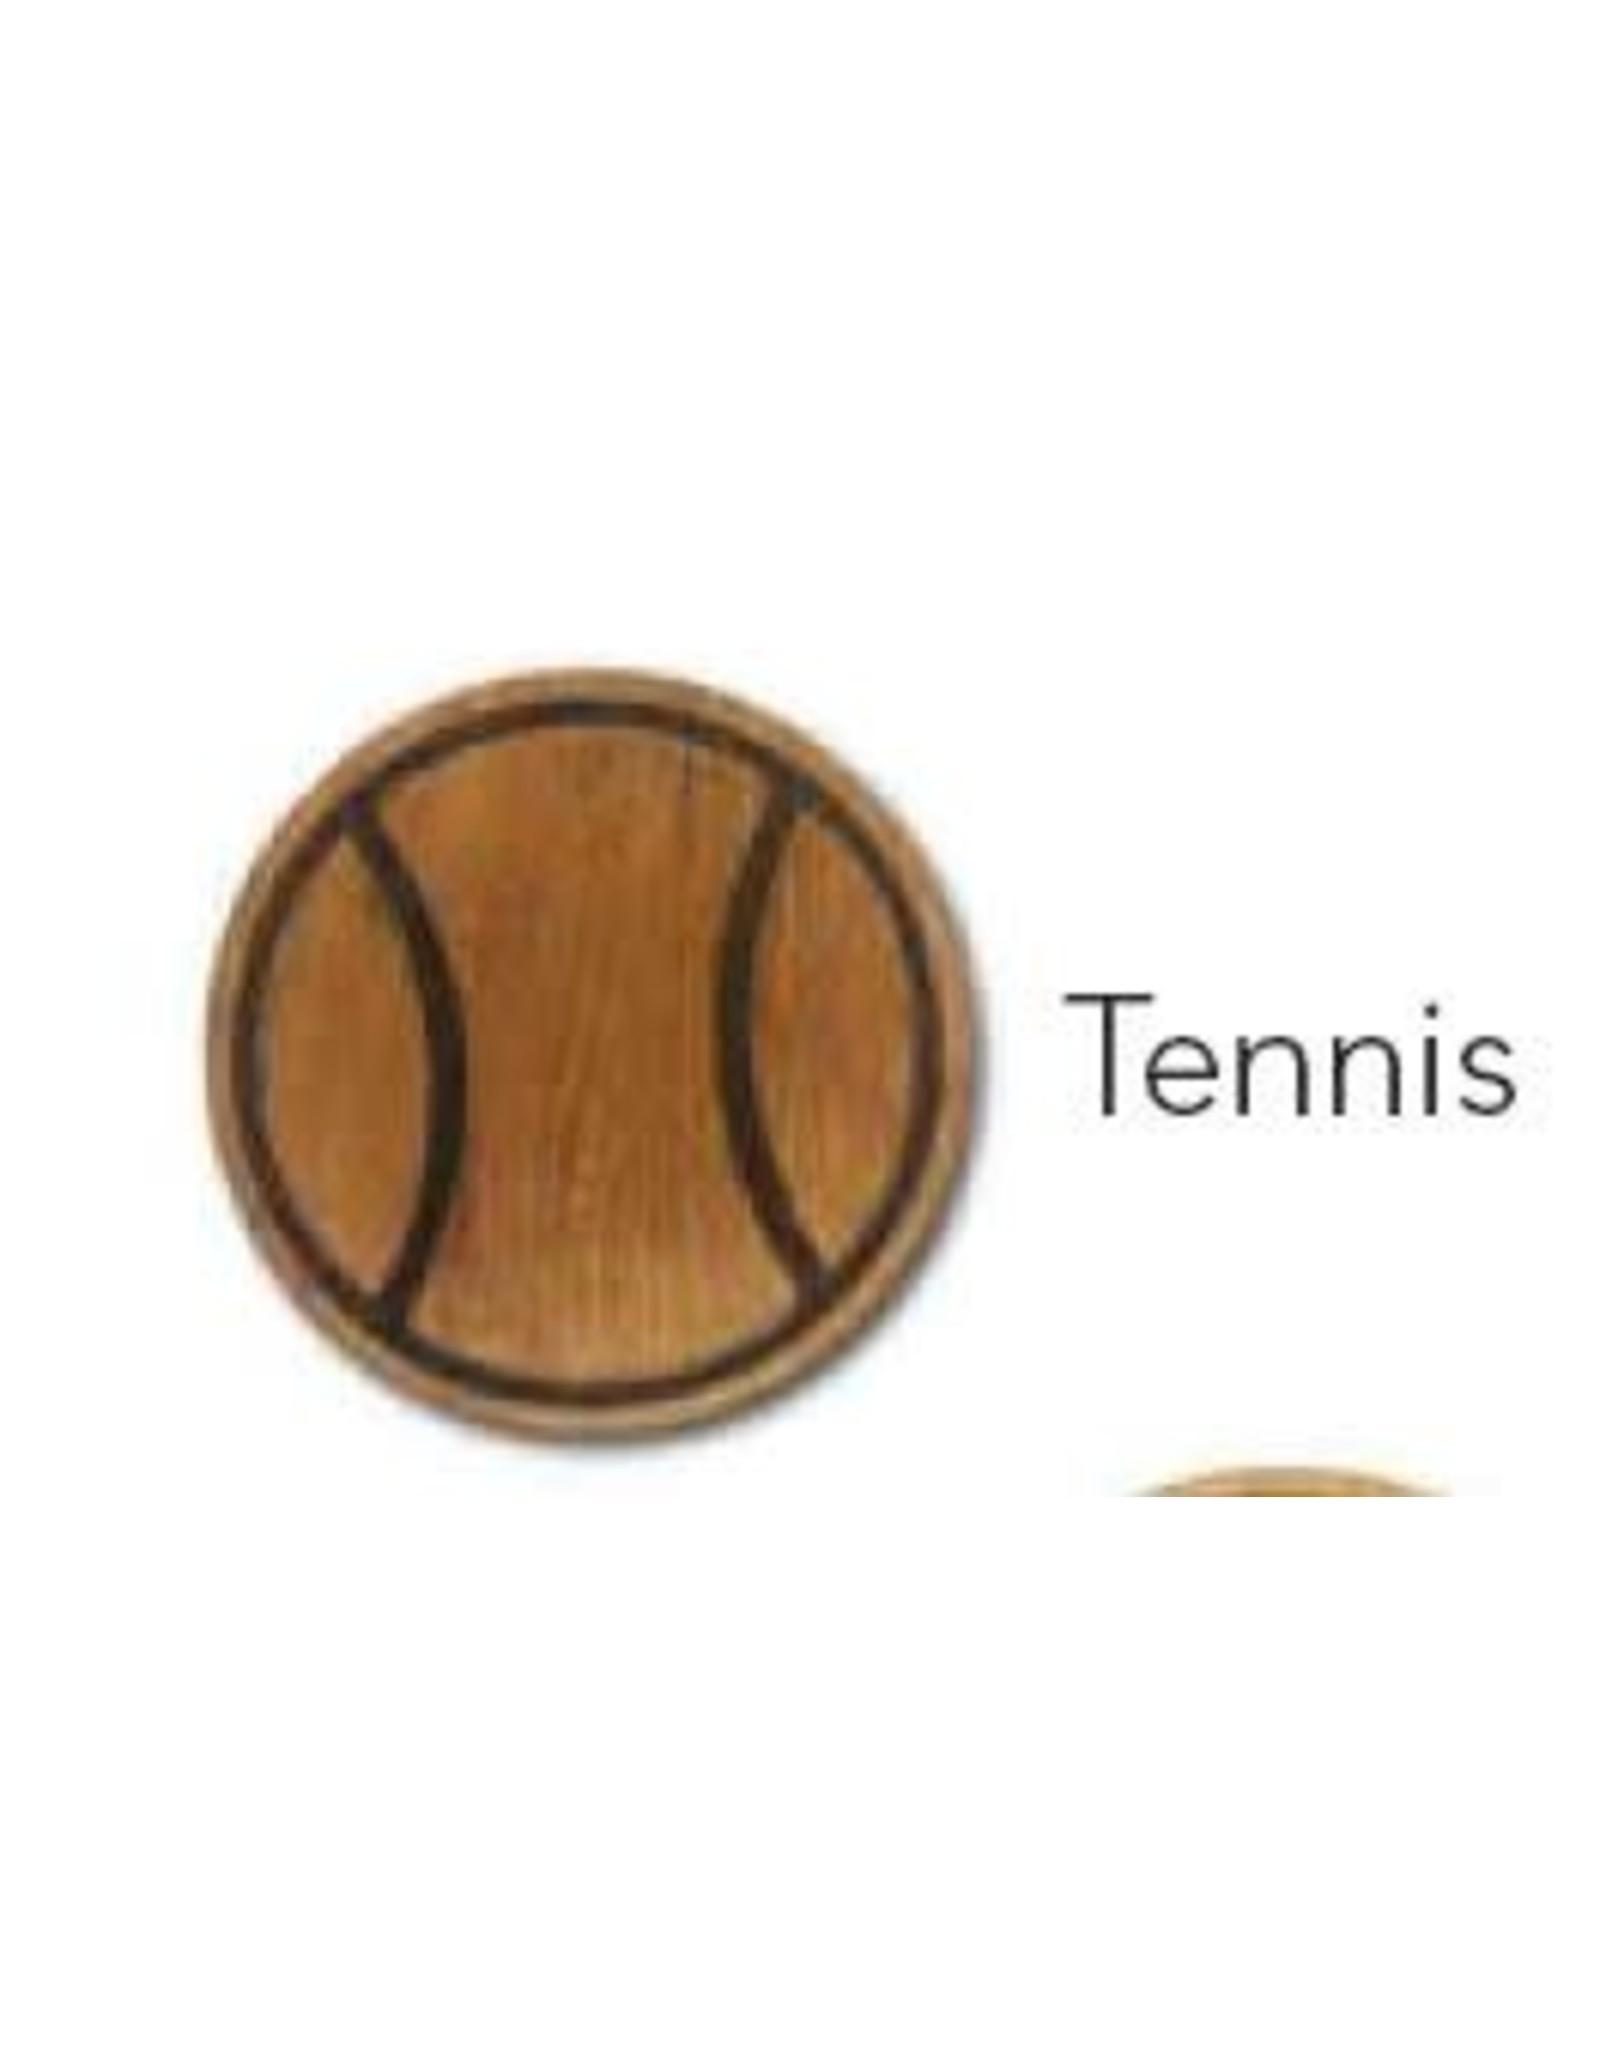 Racquet Inc Premium Wood Drink Coasters (Tennis)